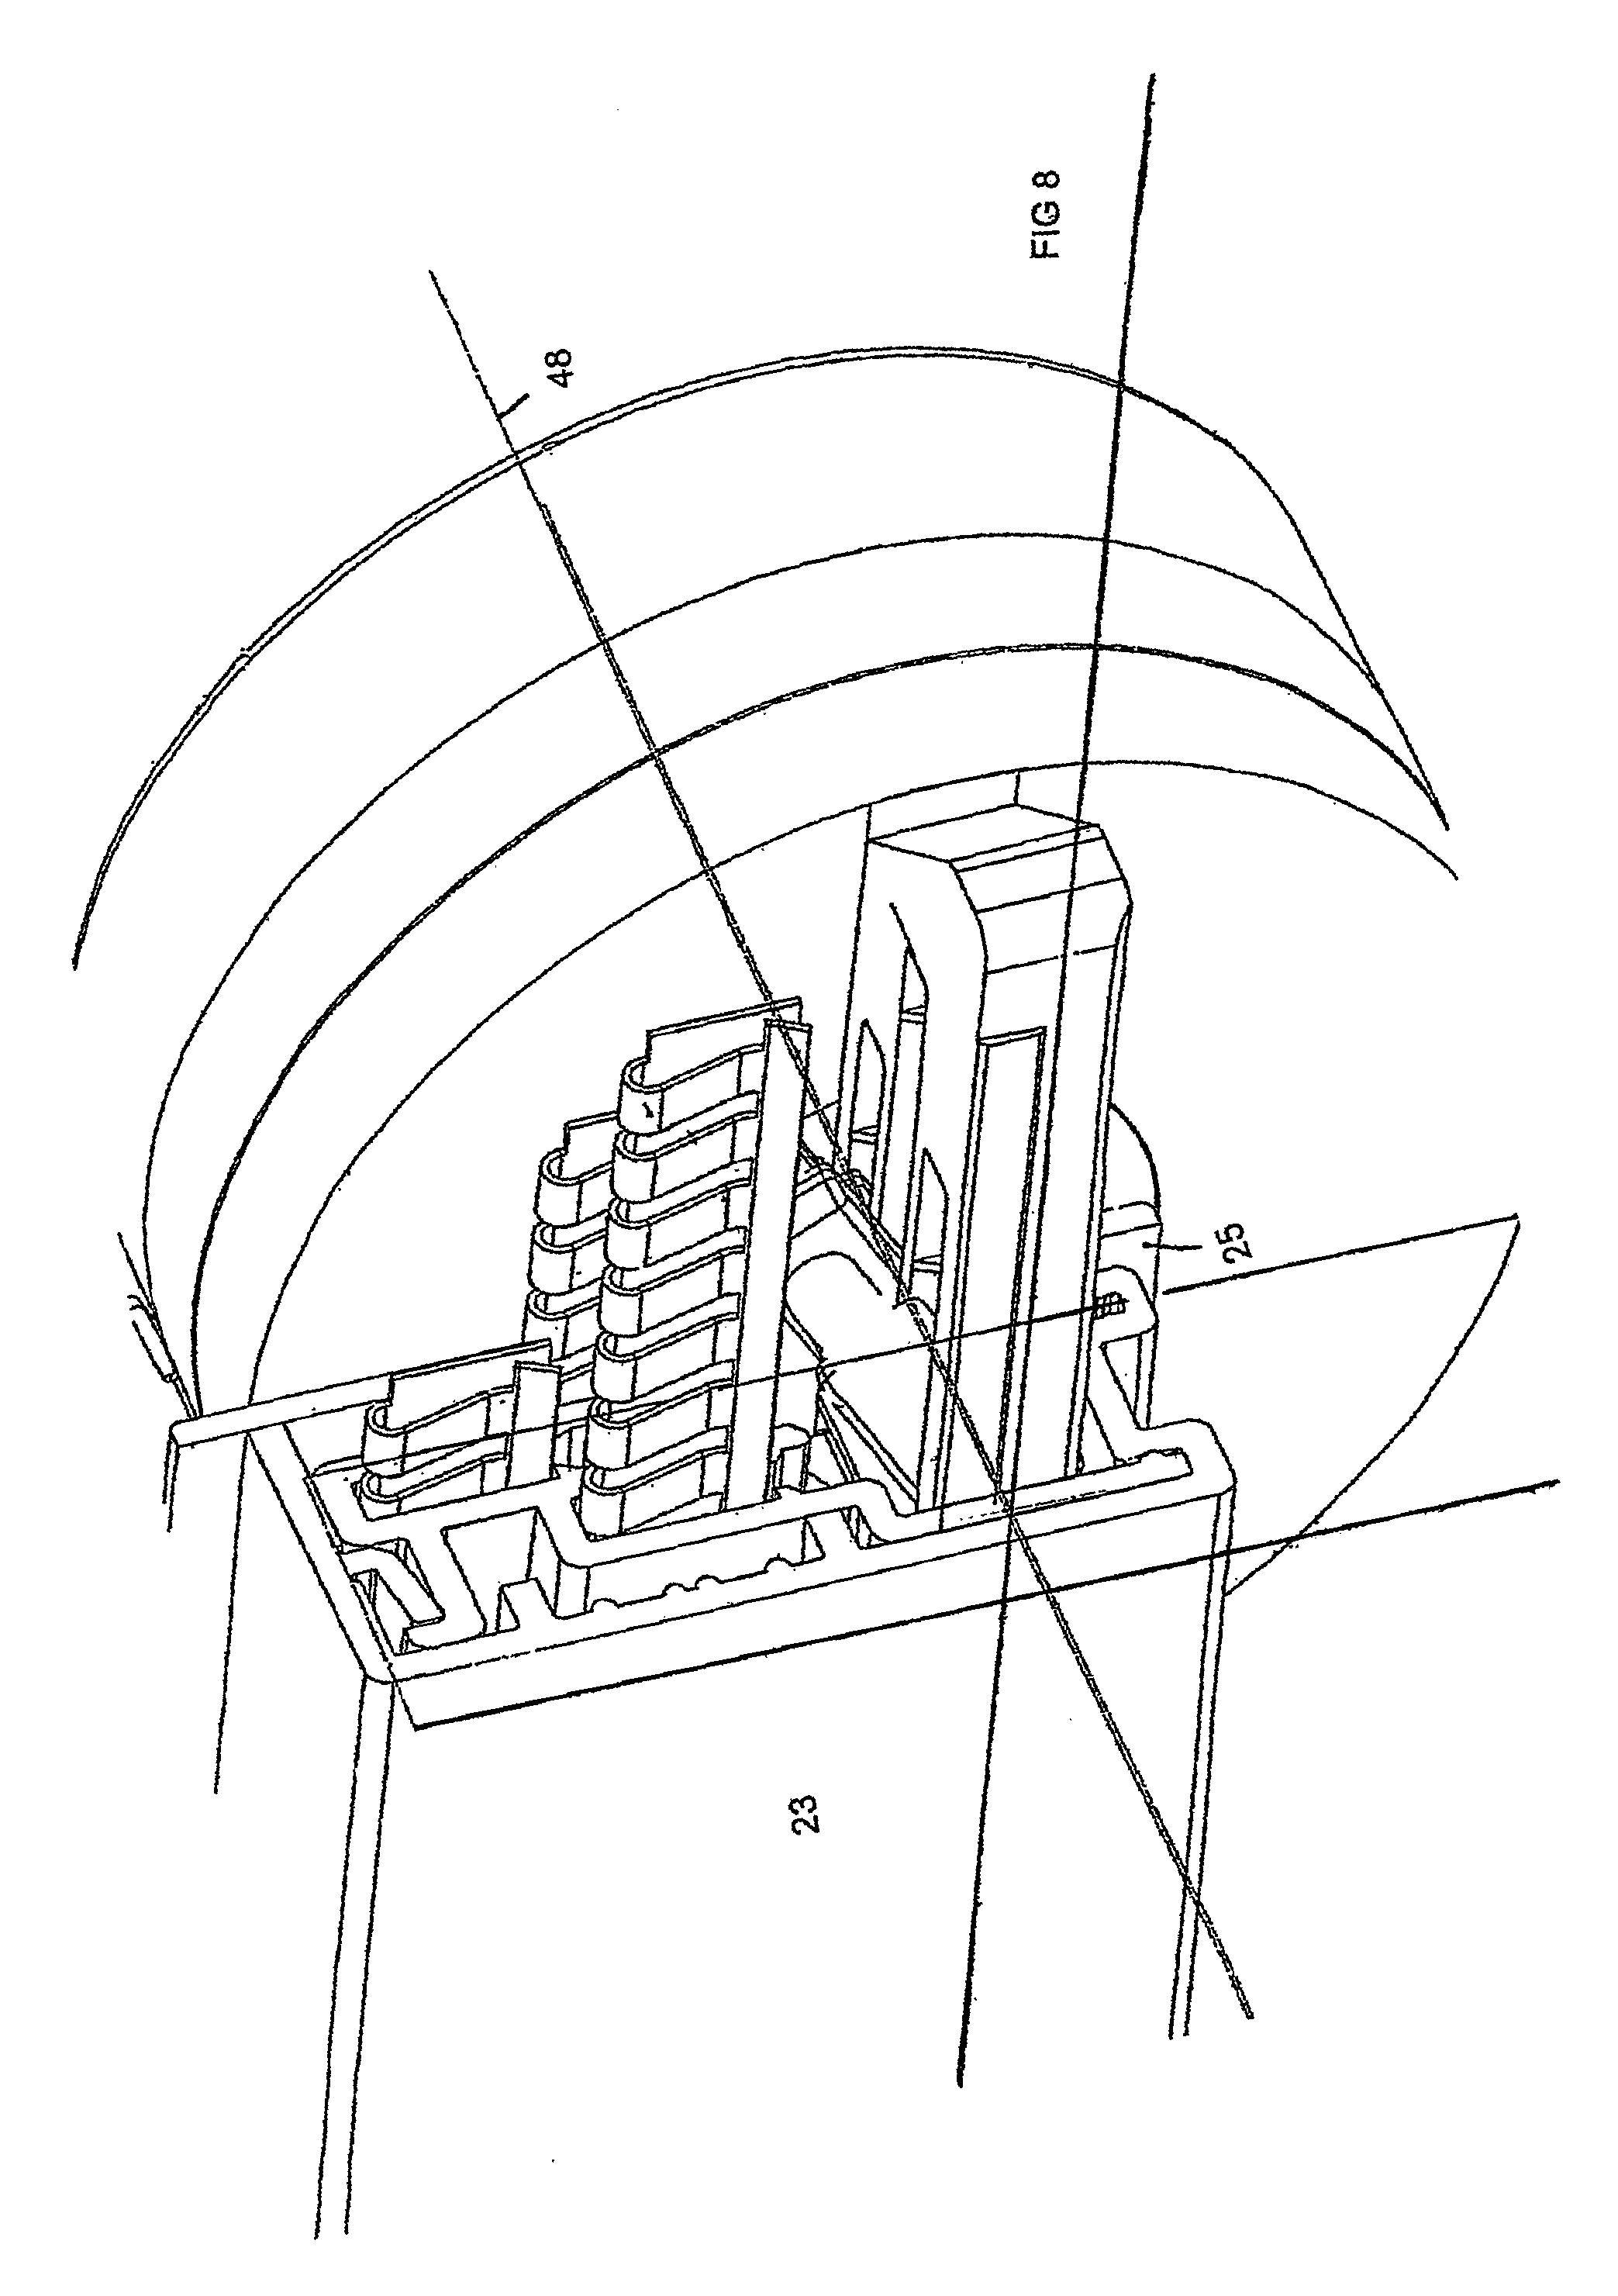 Kenwood Kdc 138 Radio Wiring Diagram together with 02 F150 Stereo Wiring Diagram additionally Sony Xplod  lifier Wiring Diagram in addition Lg Wiring Diagrams as well Jensen Stereo Wiring Diagram. on ford bluetooth wiring diagram